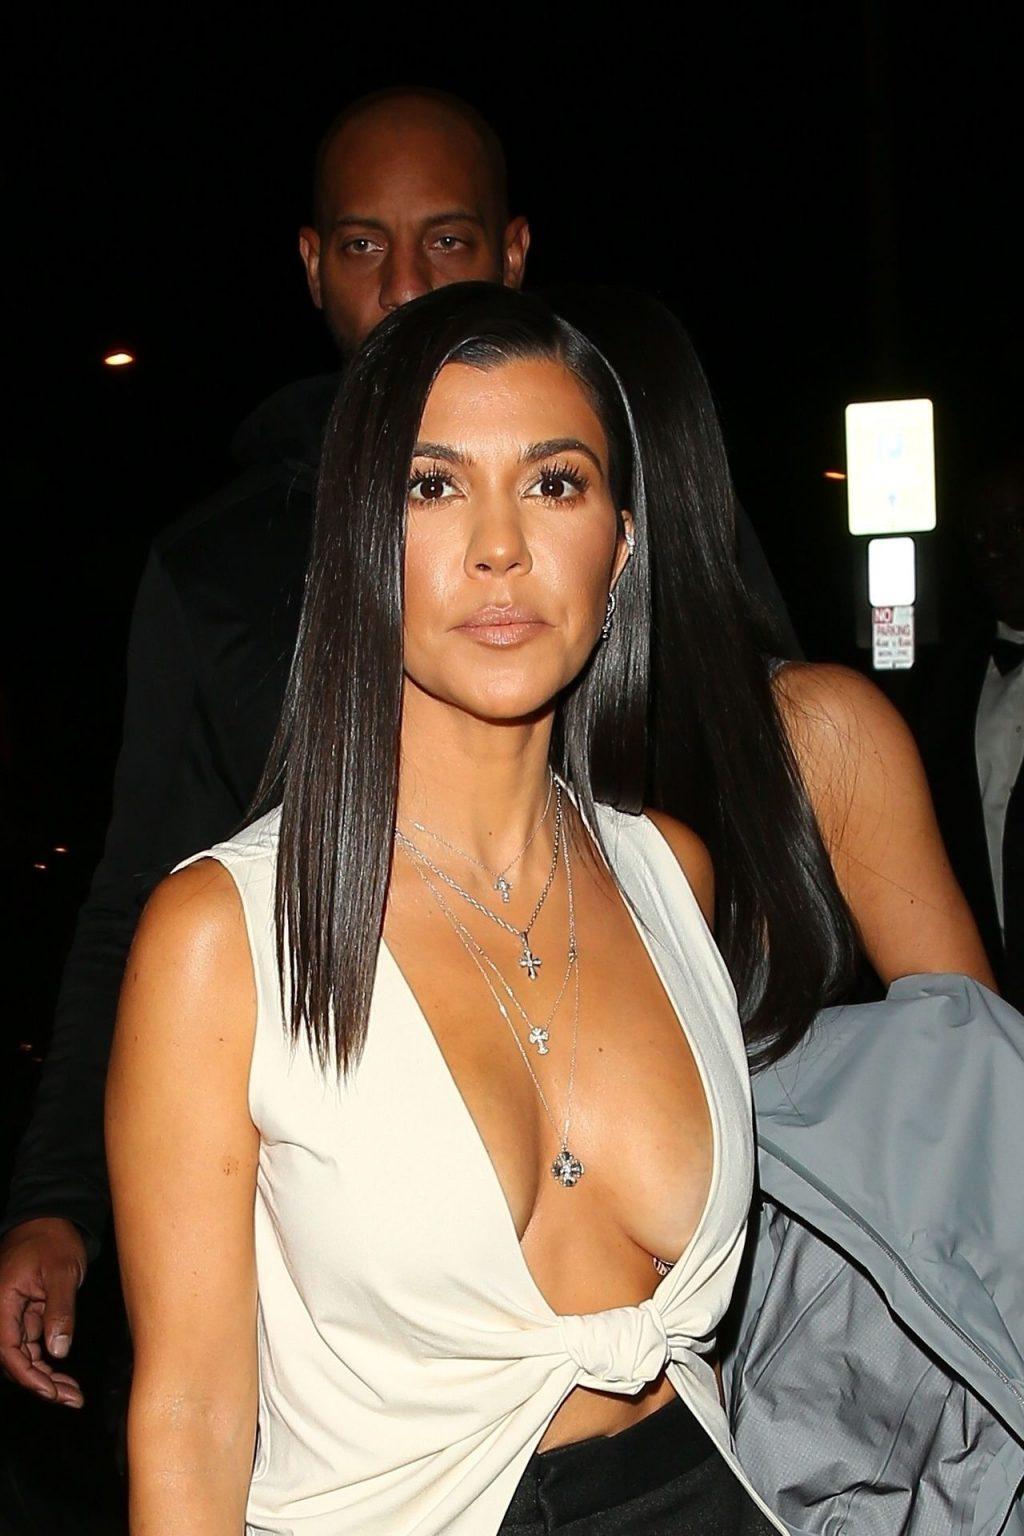 Kourtney Kardashian Cleavage